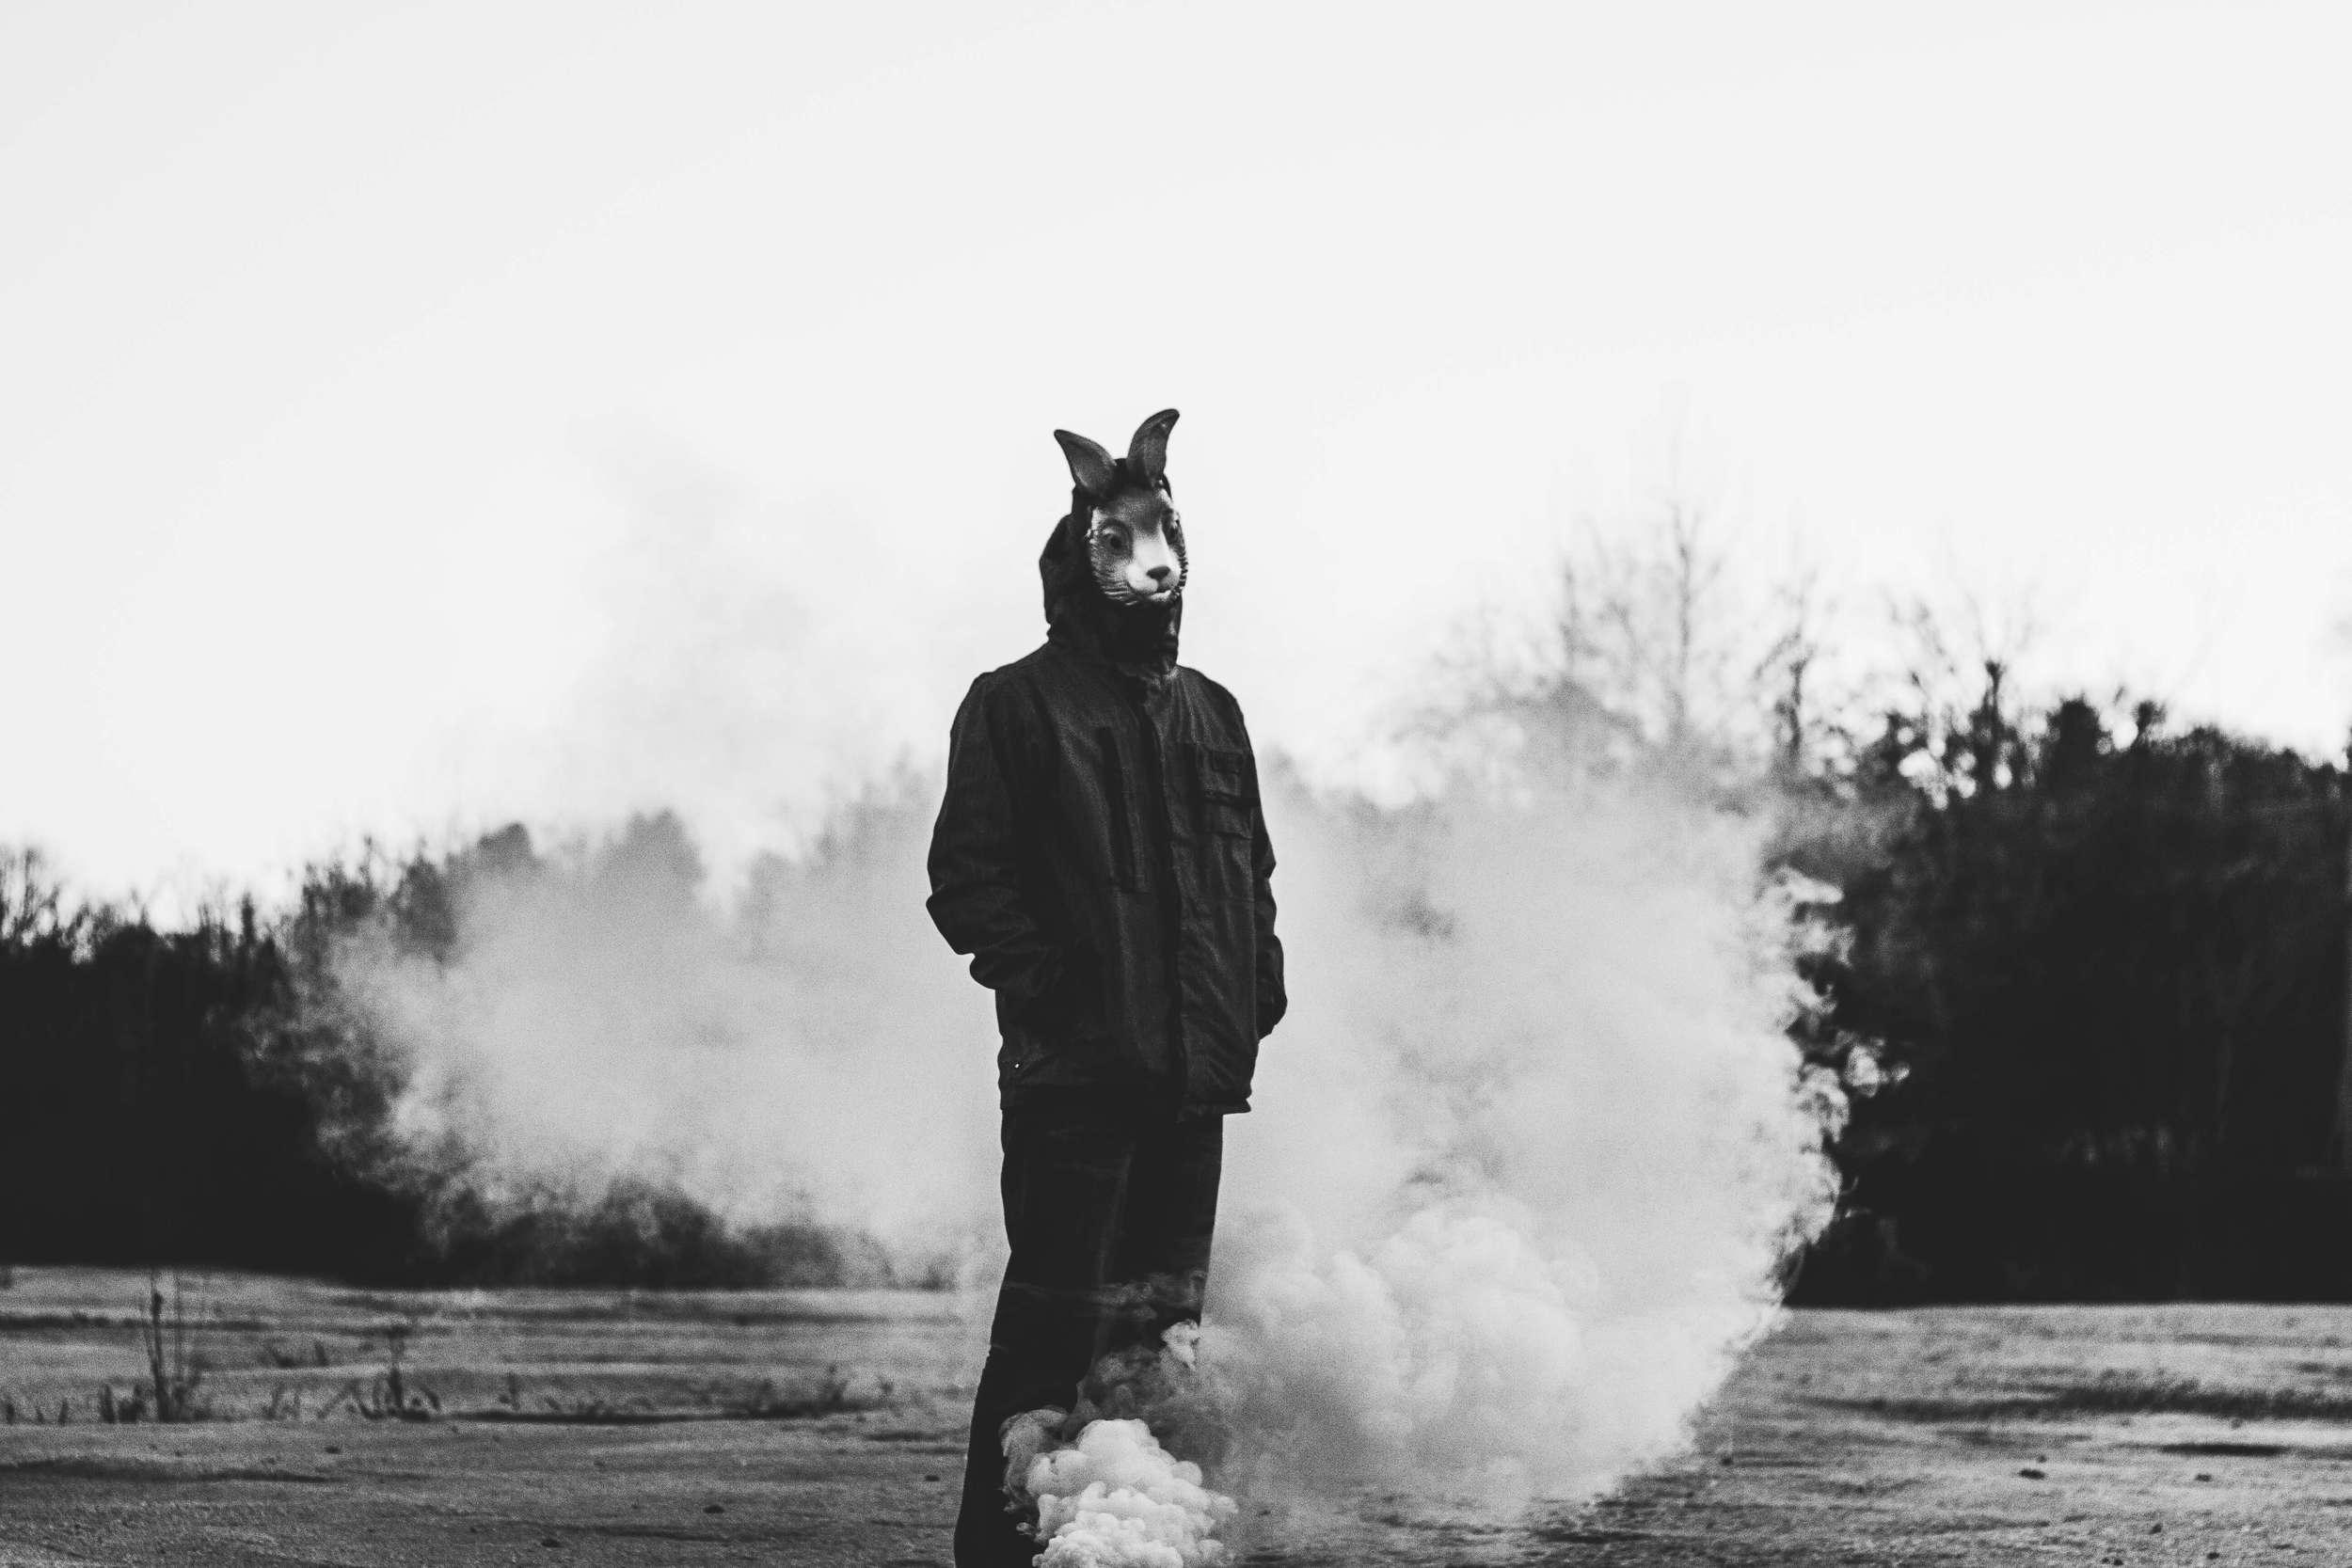 rabbit-mask_23584745210_o.jpg